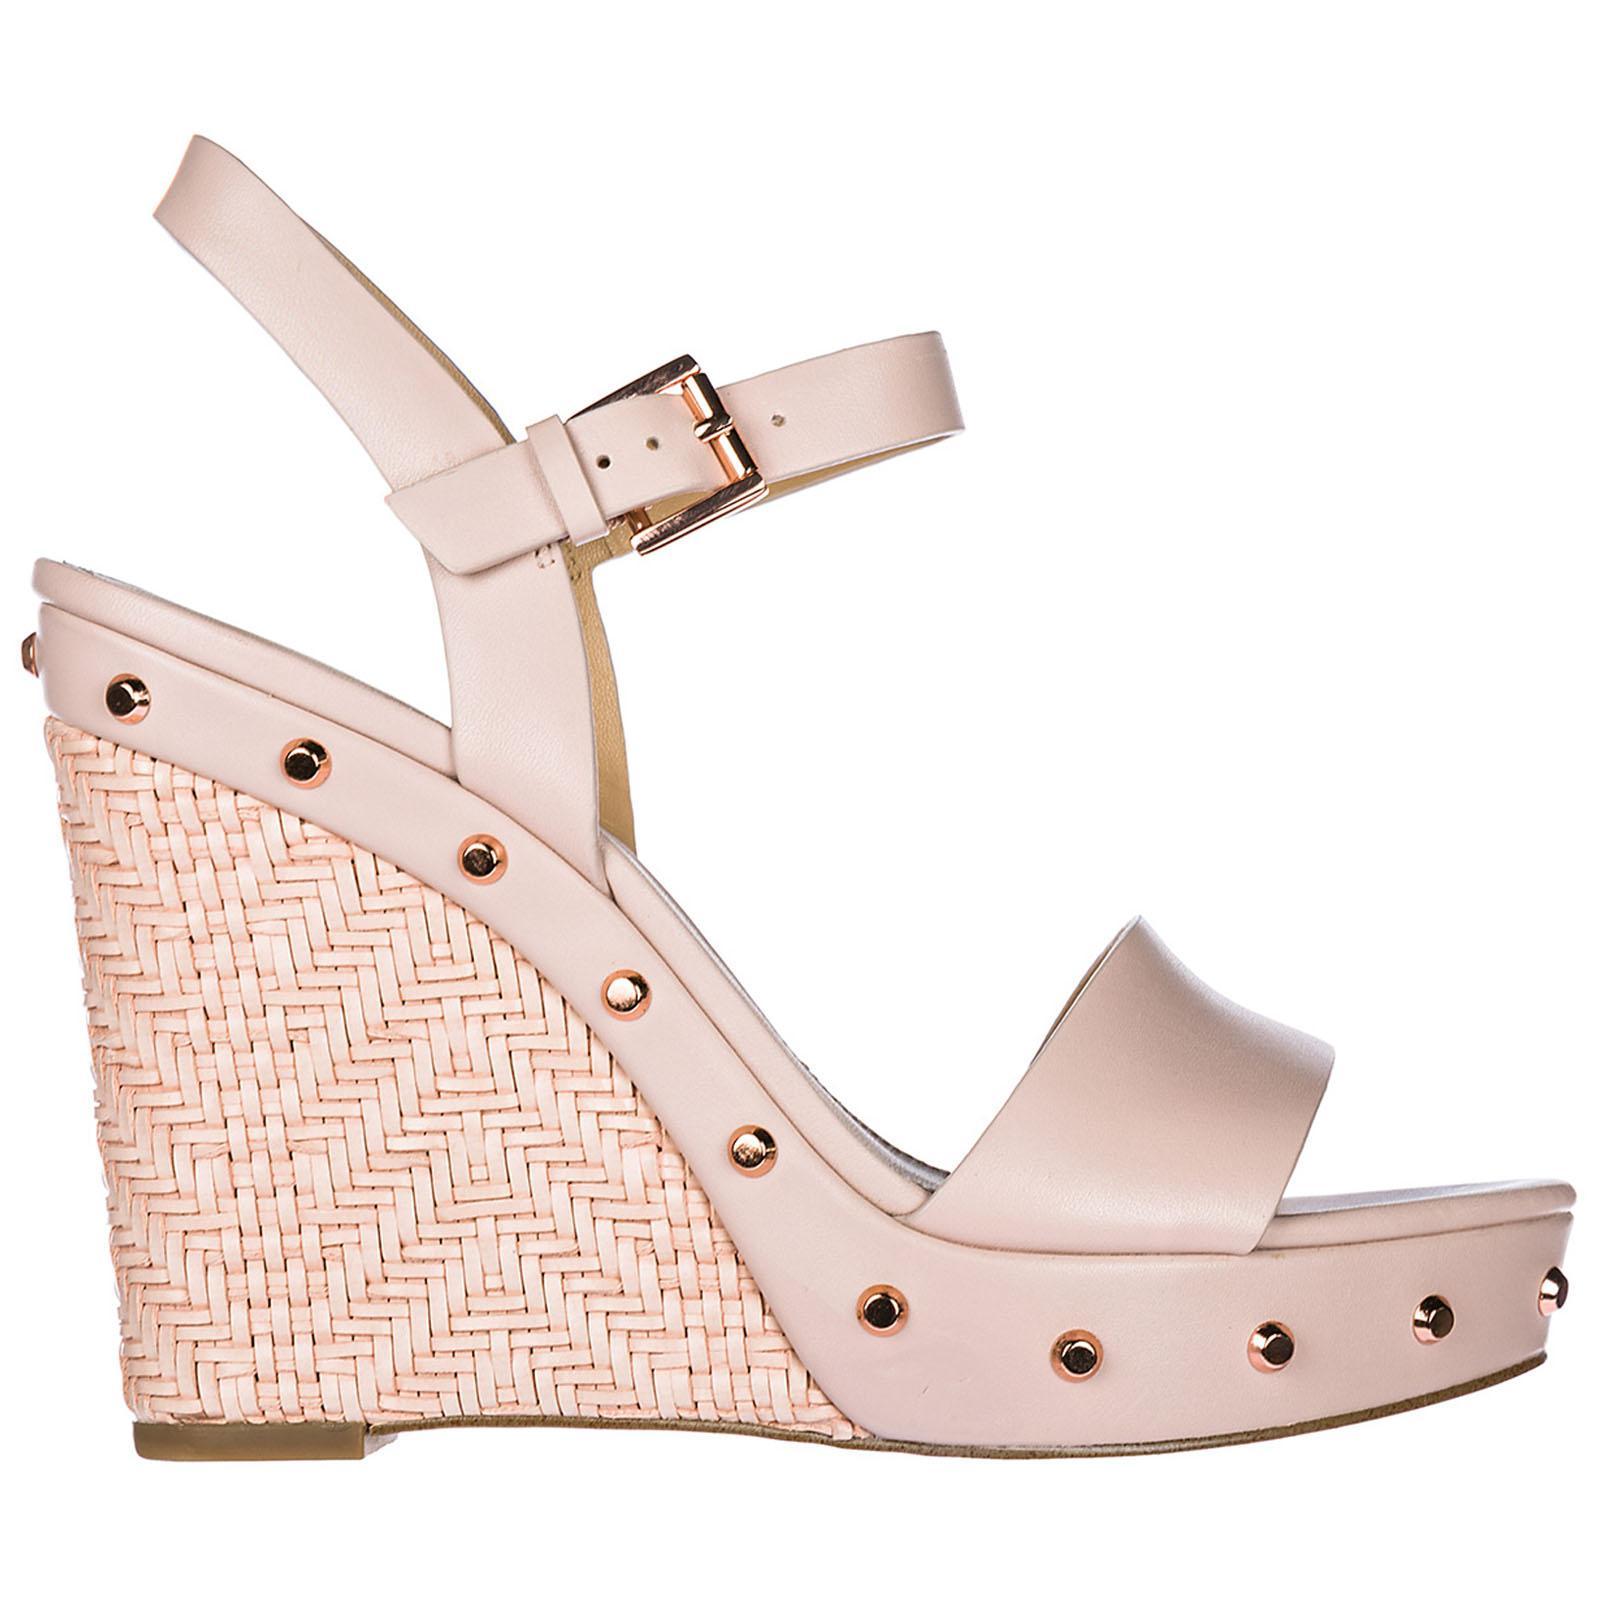 277974f4fe Michael Kors Leather Shoes Wedges Sandals Ellen in Pink - Lyst